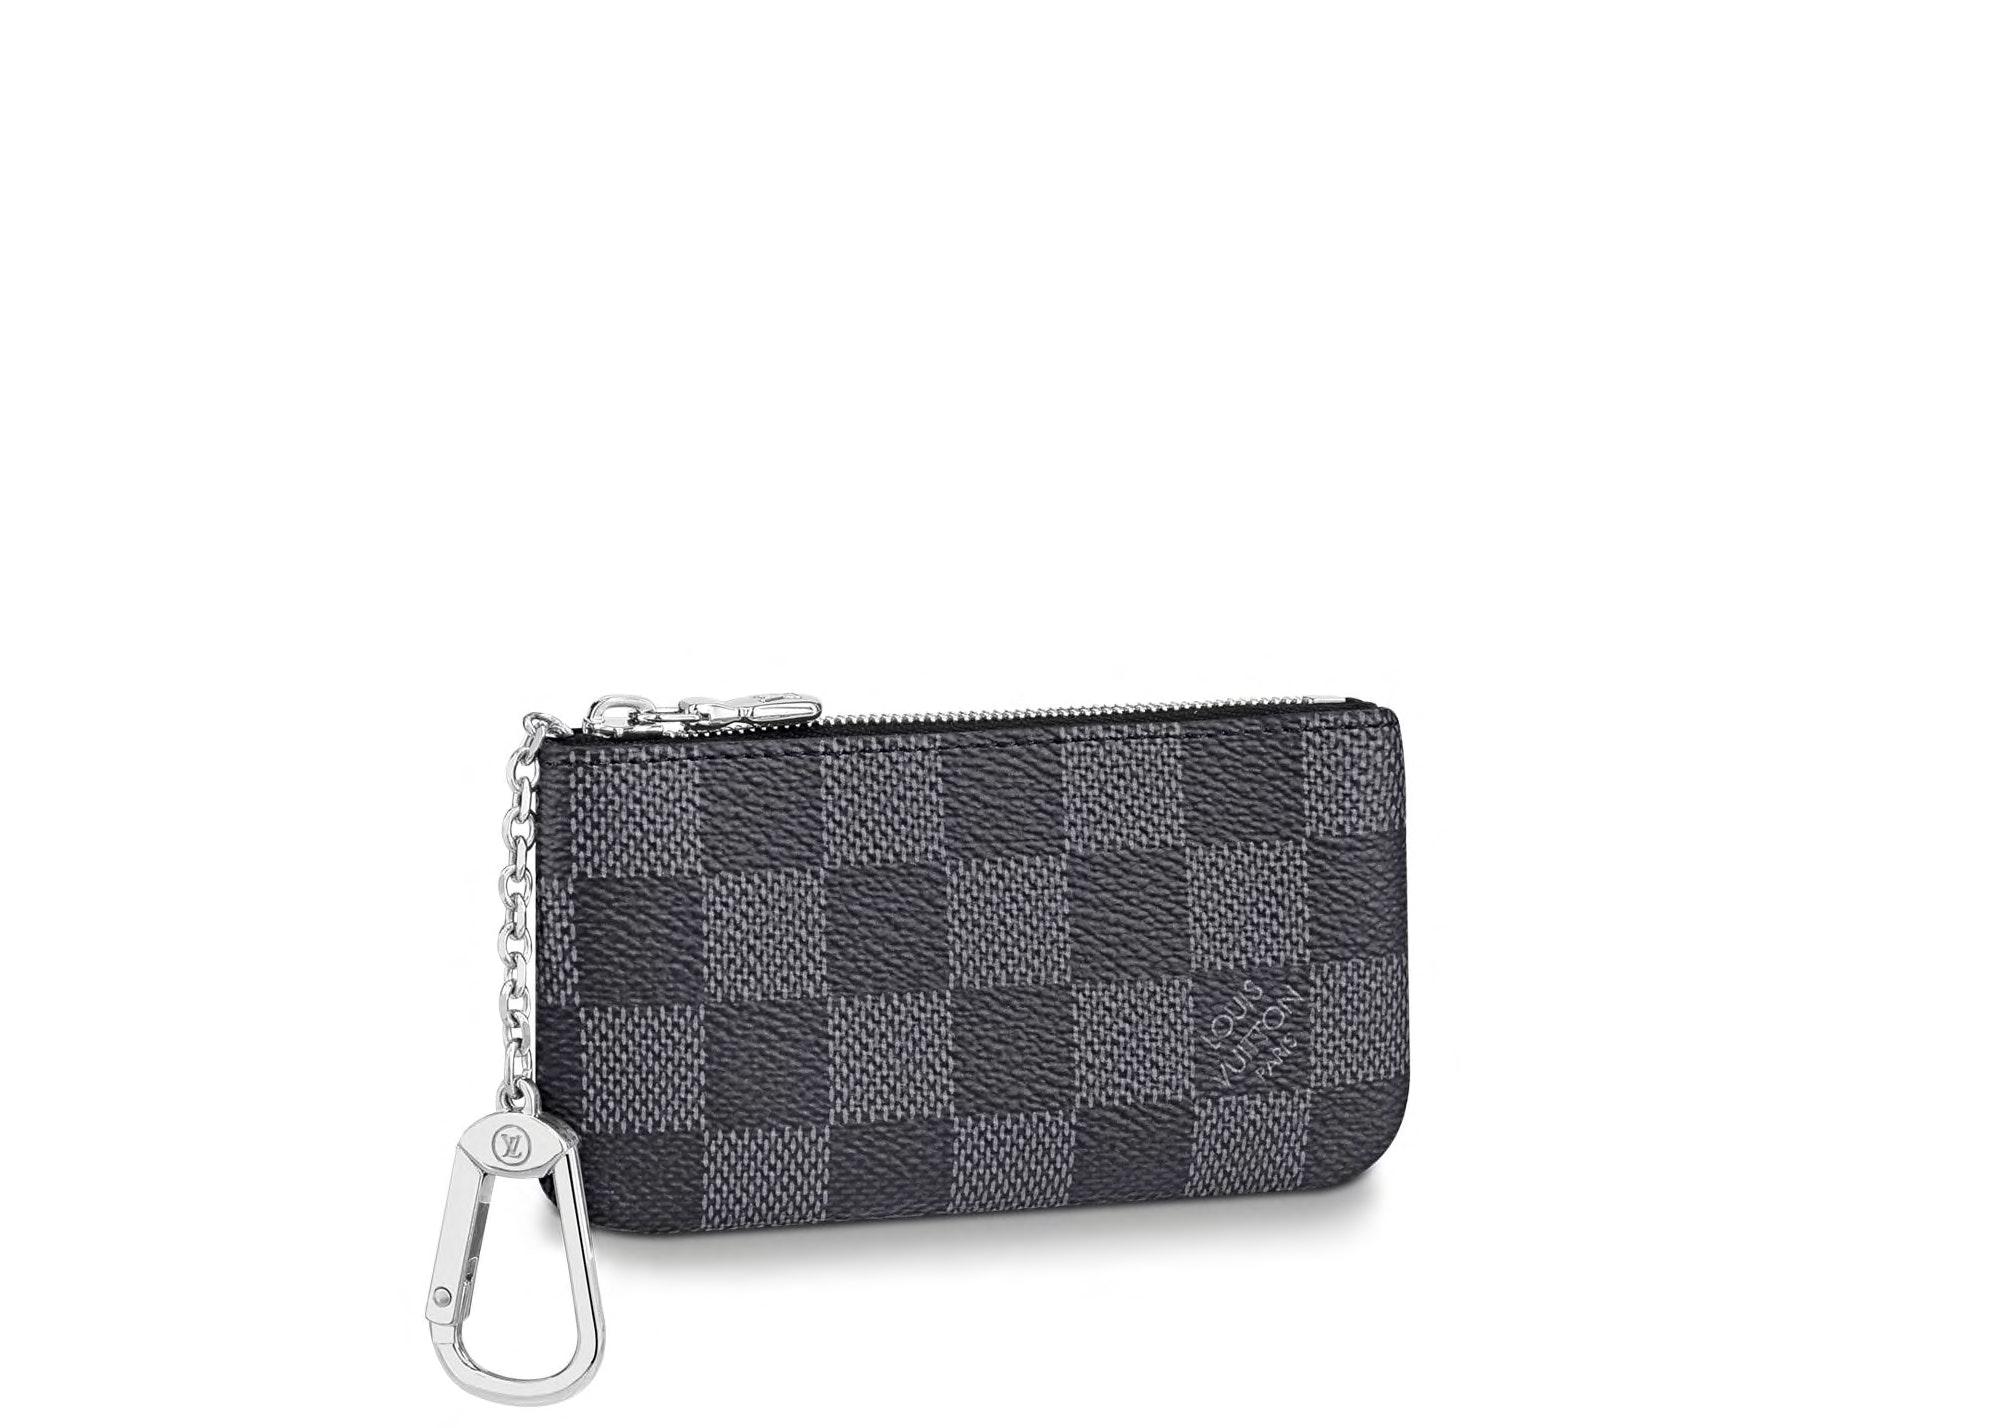 Louis Vuitton Pochette Cle Key Pouch Damier Graphite Black/Gray